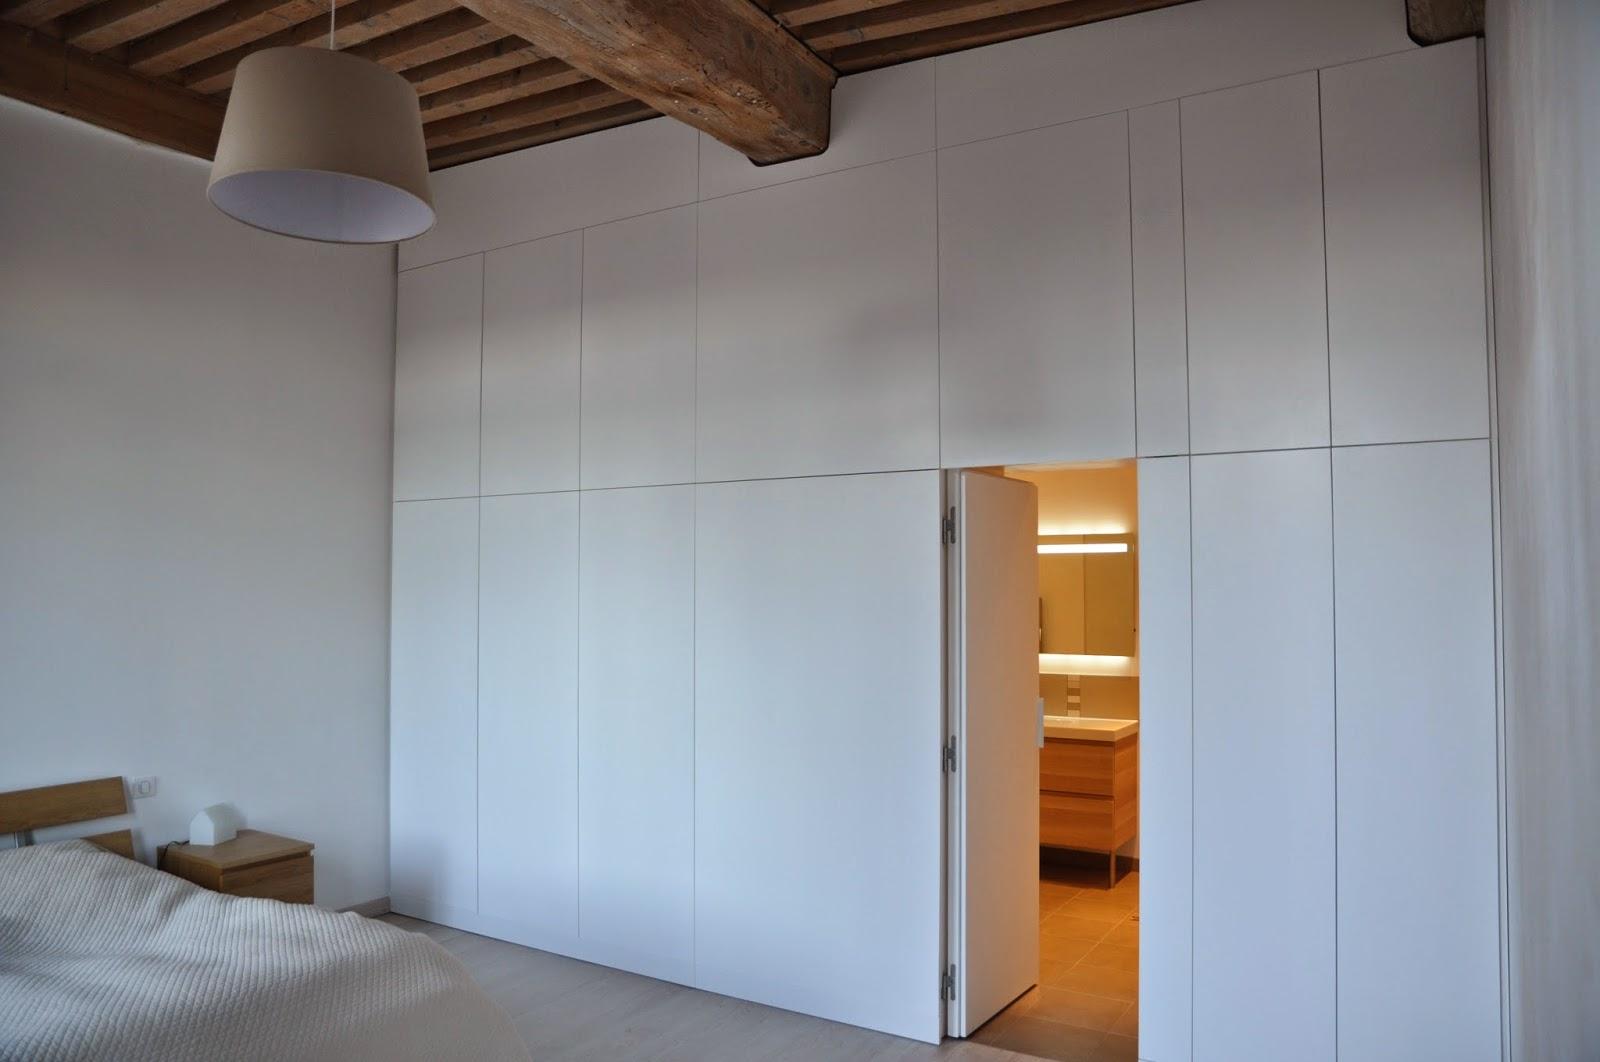 indoordesign architecture d 39 int rieur lyon c lu 1 68 m livr. Black Bedroom Furniture Sets. Home Design Ideas